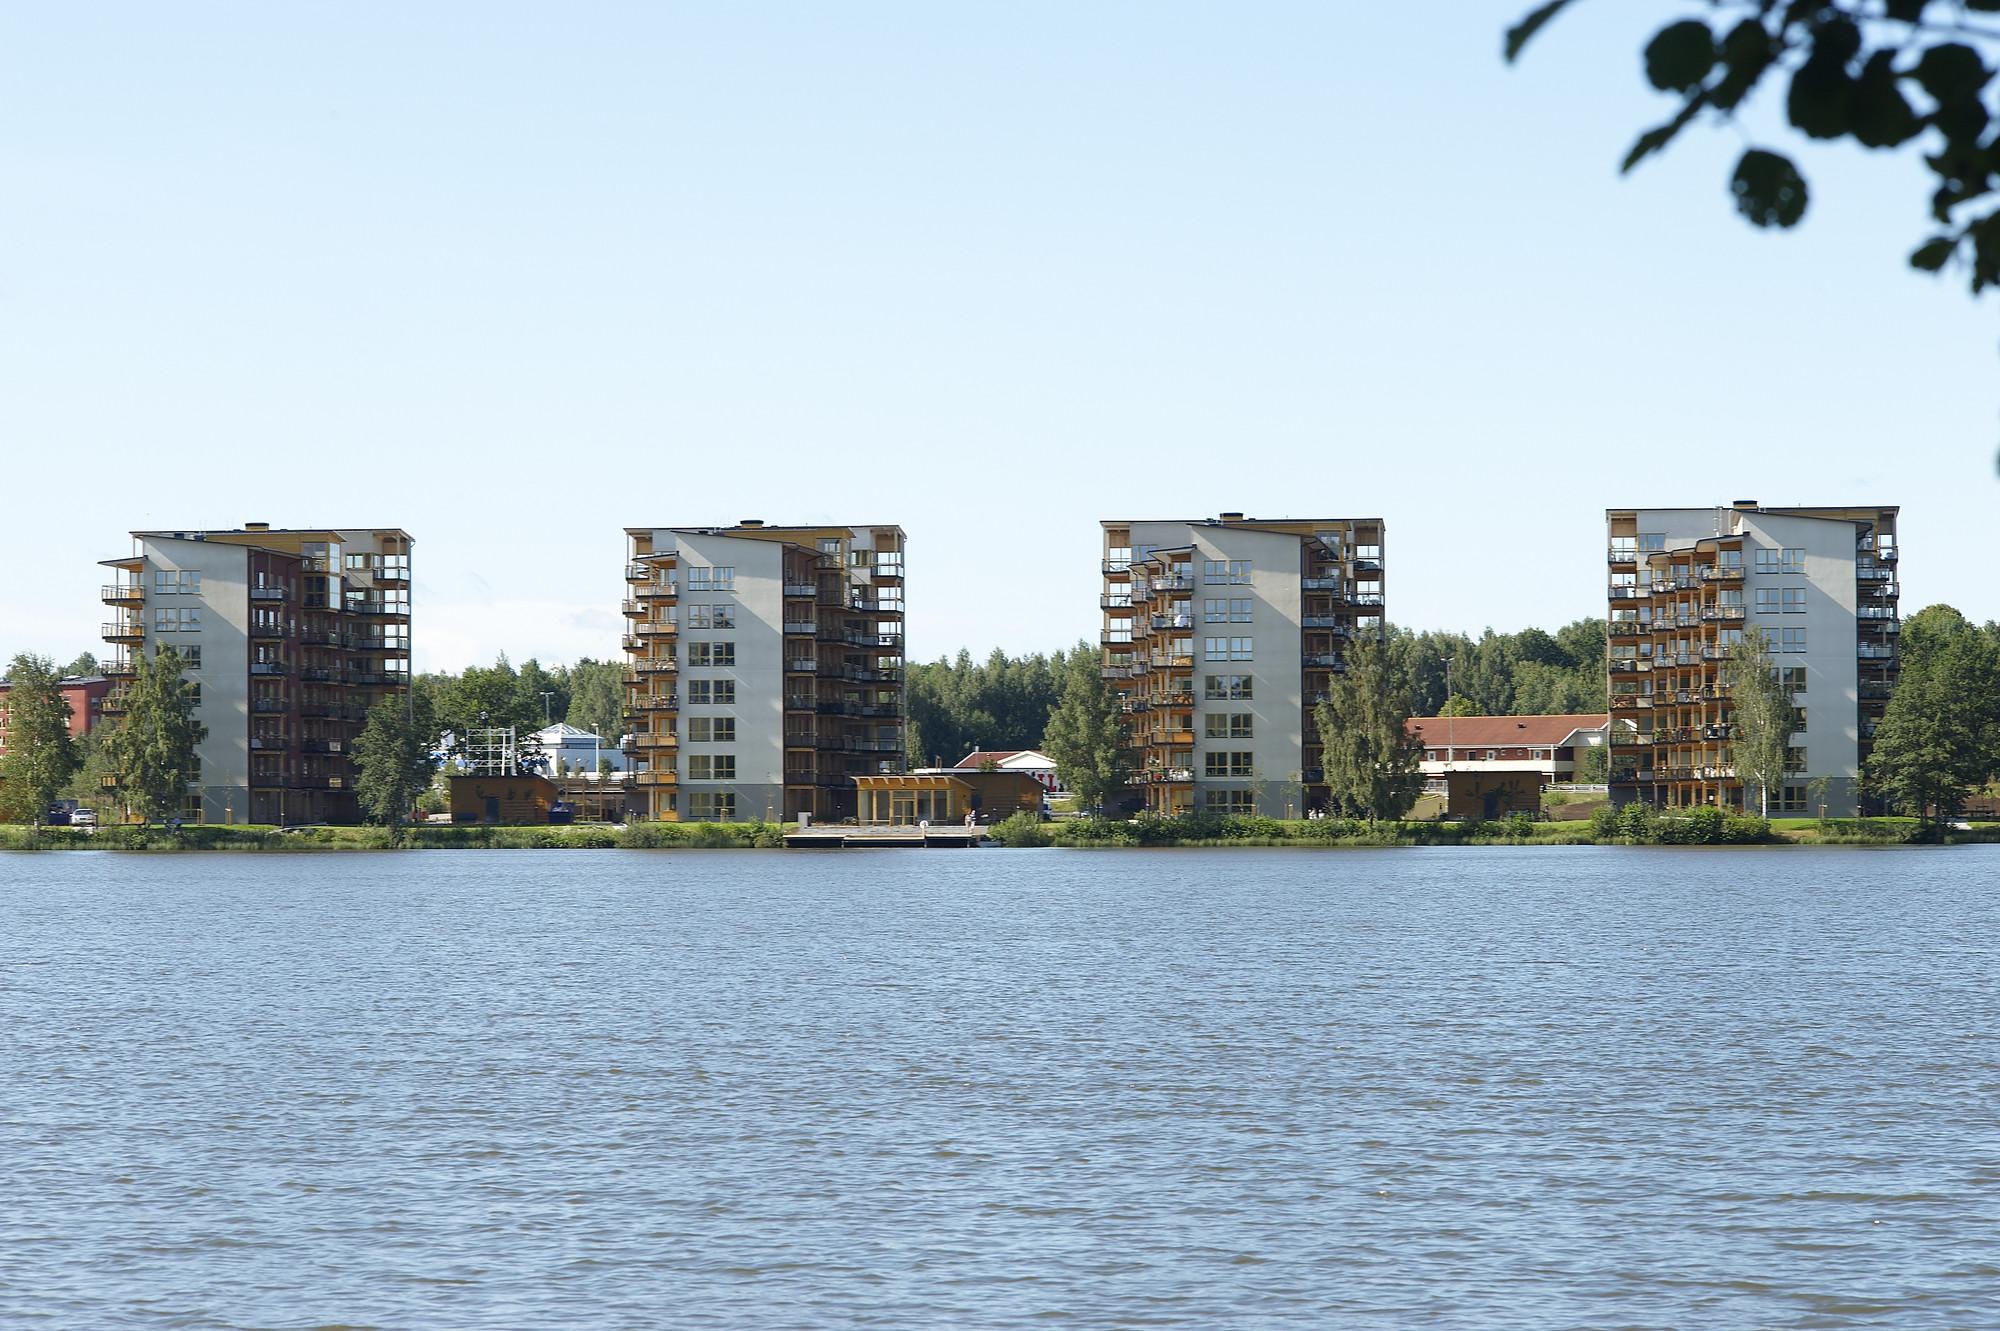 Limnologen in Växjö, Sweden. Image Courtesy of Midroc Property Development